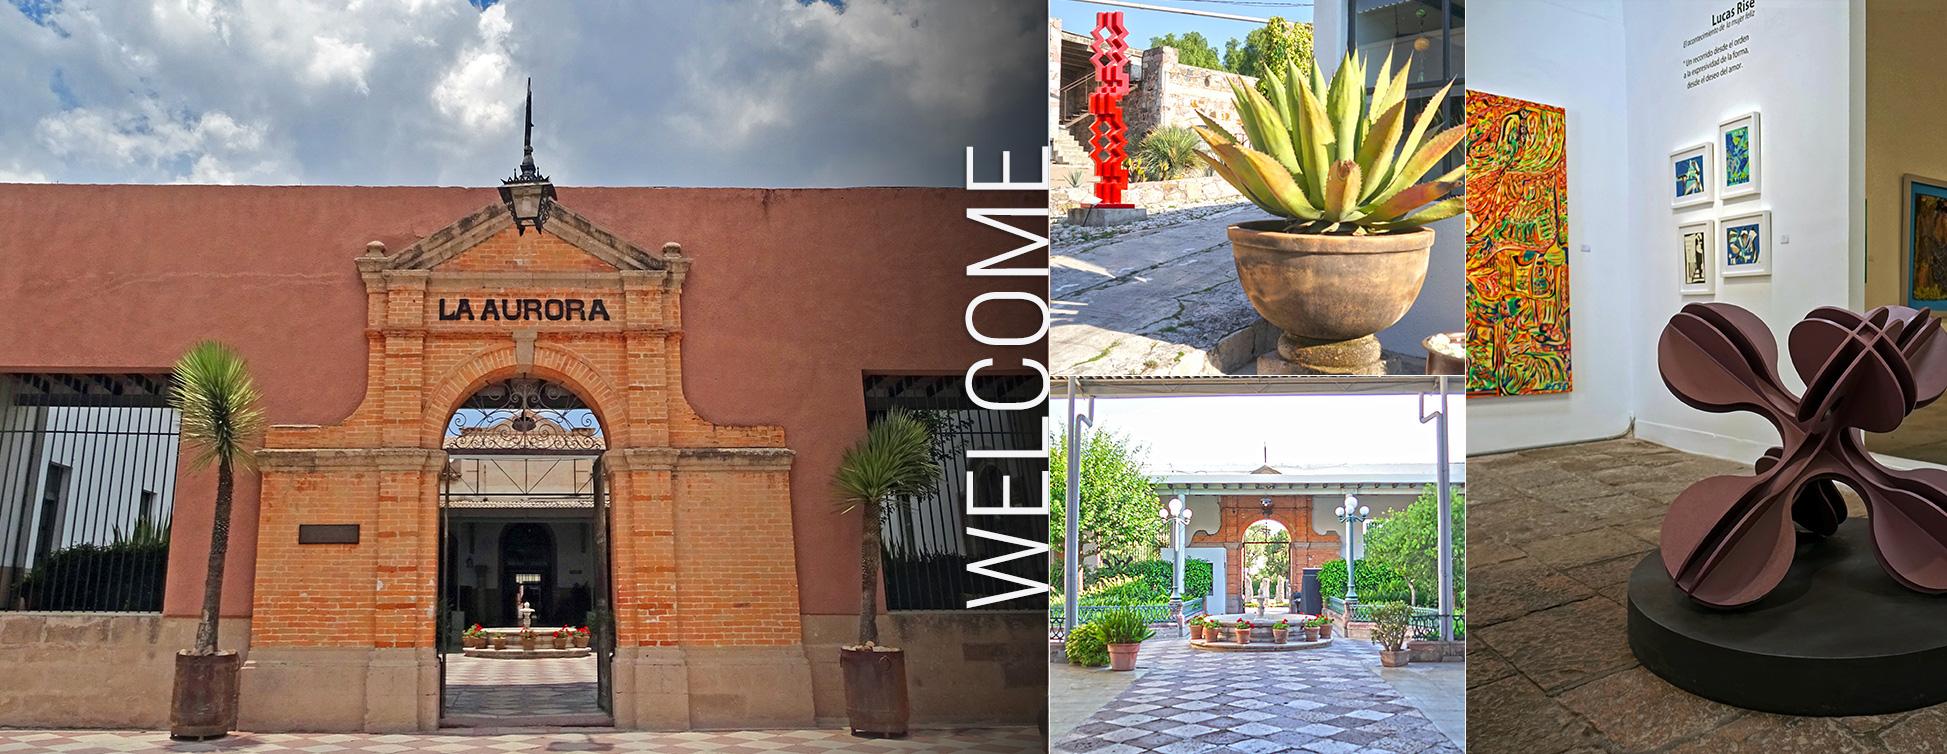 La Aurora, The Cultural Center of Art & Design, San Miguel de Allende